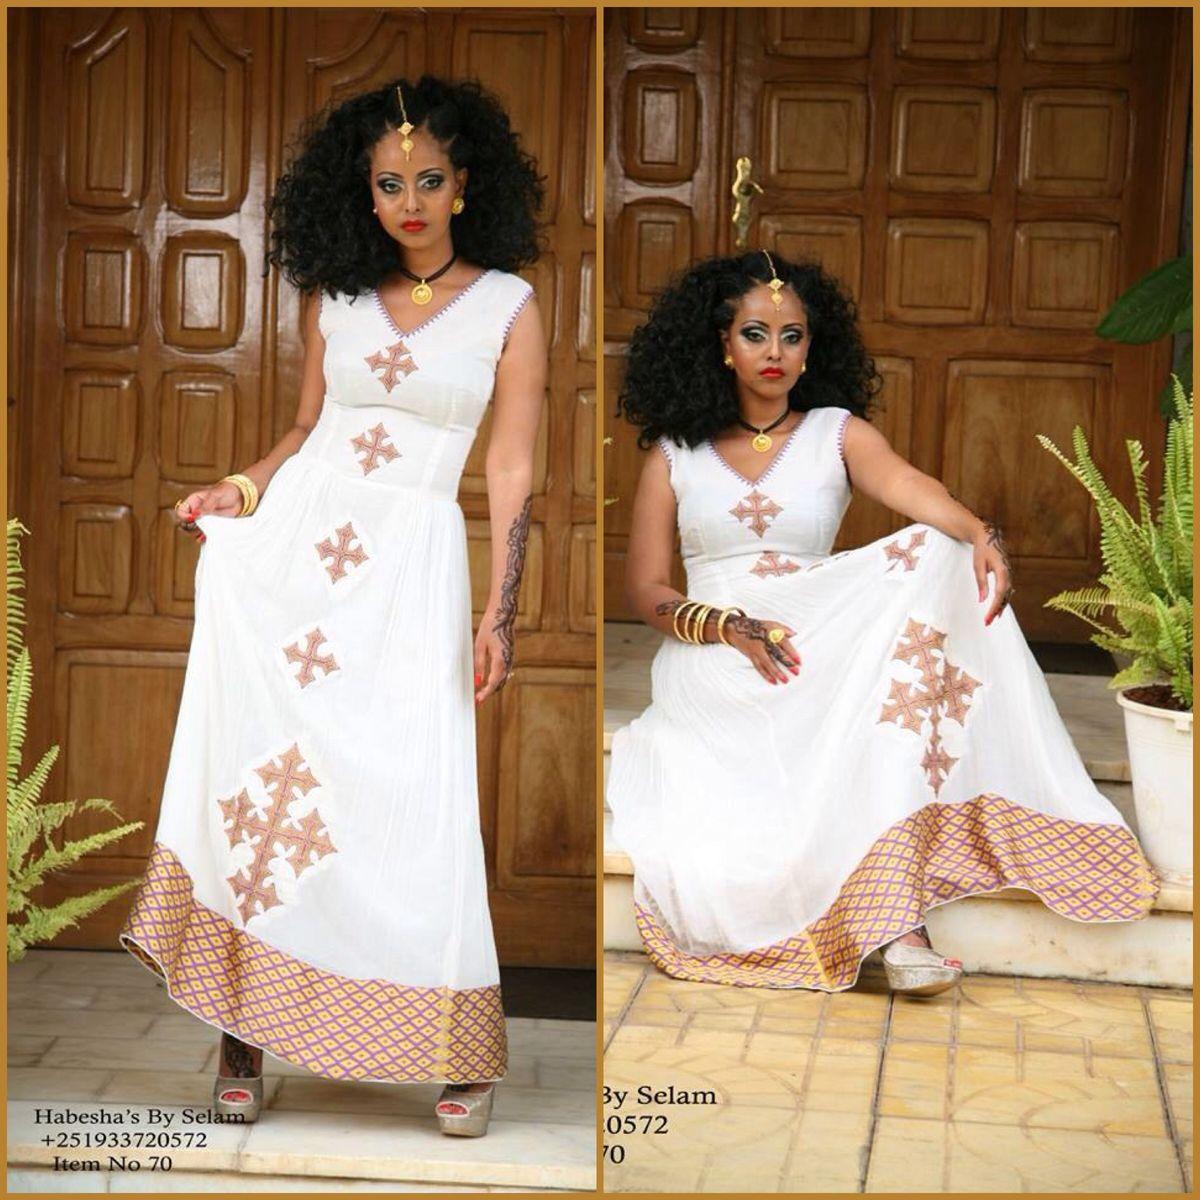 ethiopian wedding dress usa CiIeI ethiopian wedding dress Ethiopian Traditional